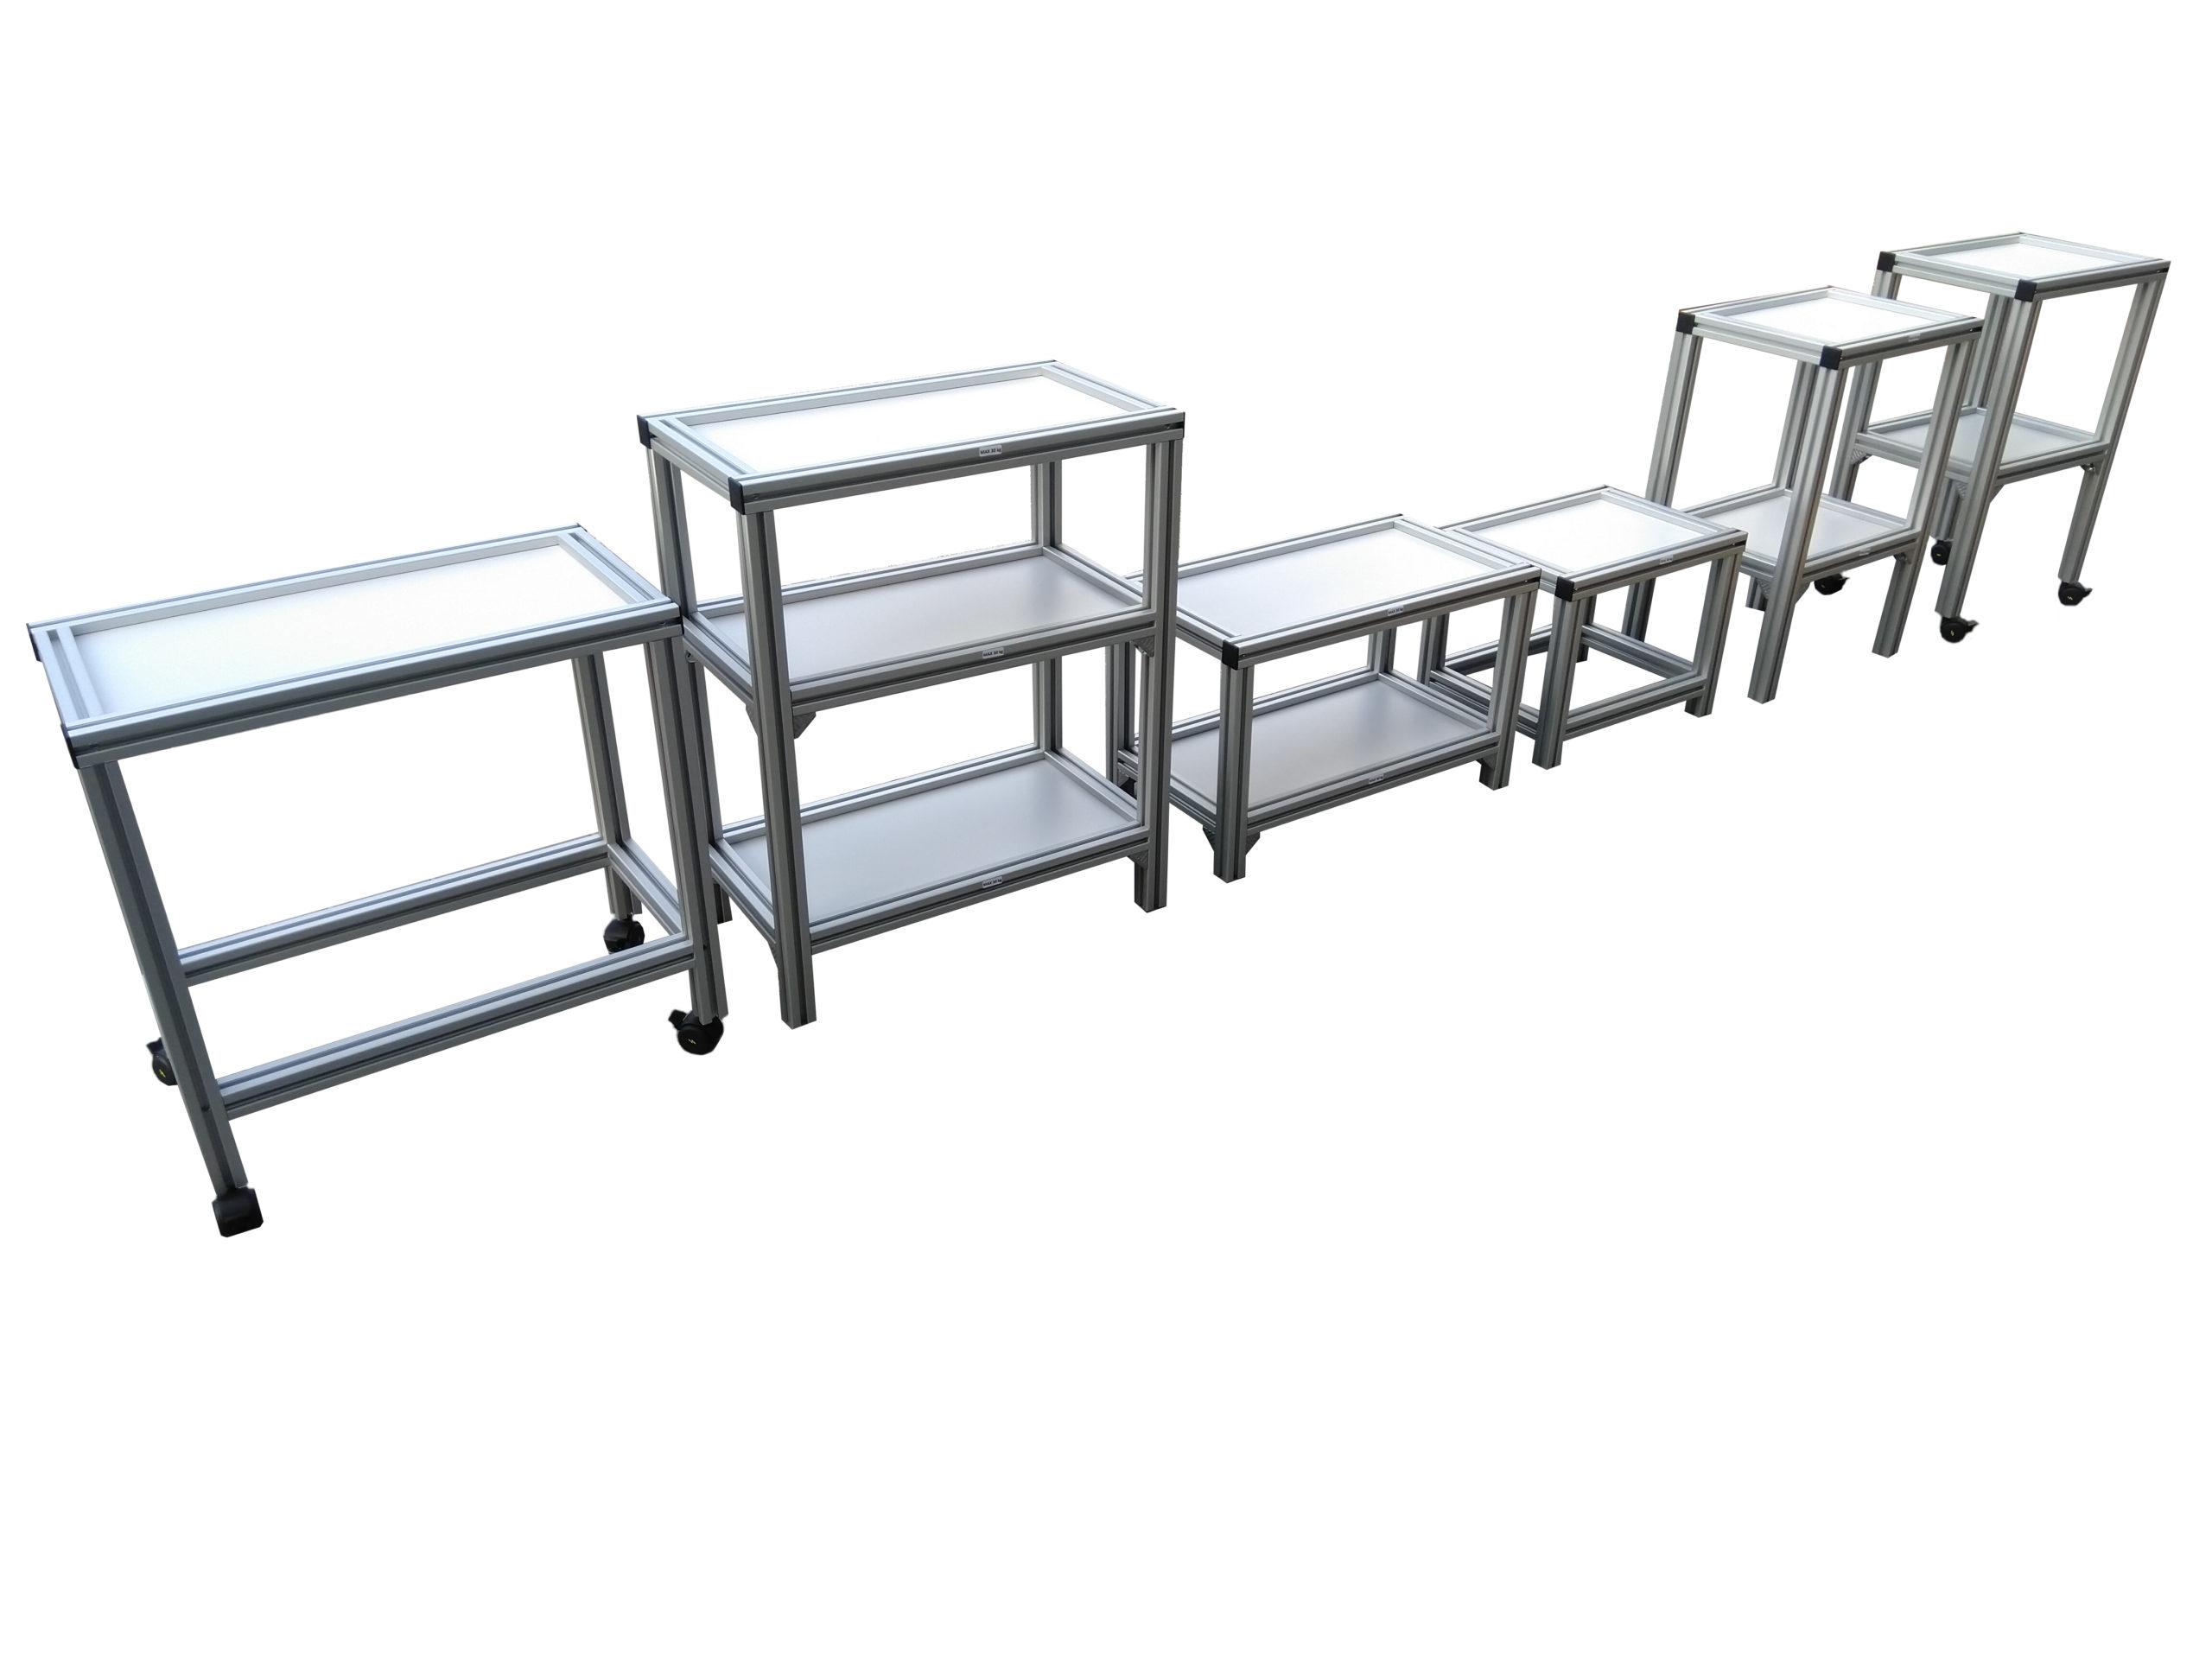 Regały meble stoły stanowiska Bosch Rexroth profile aluminiowe